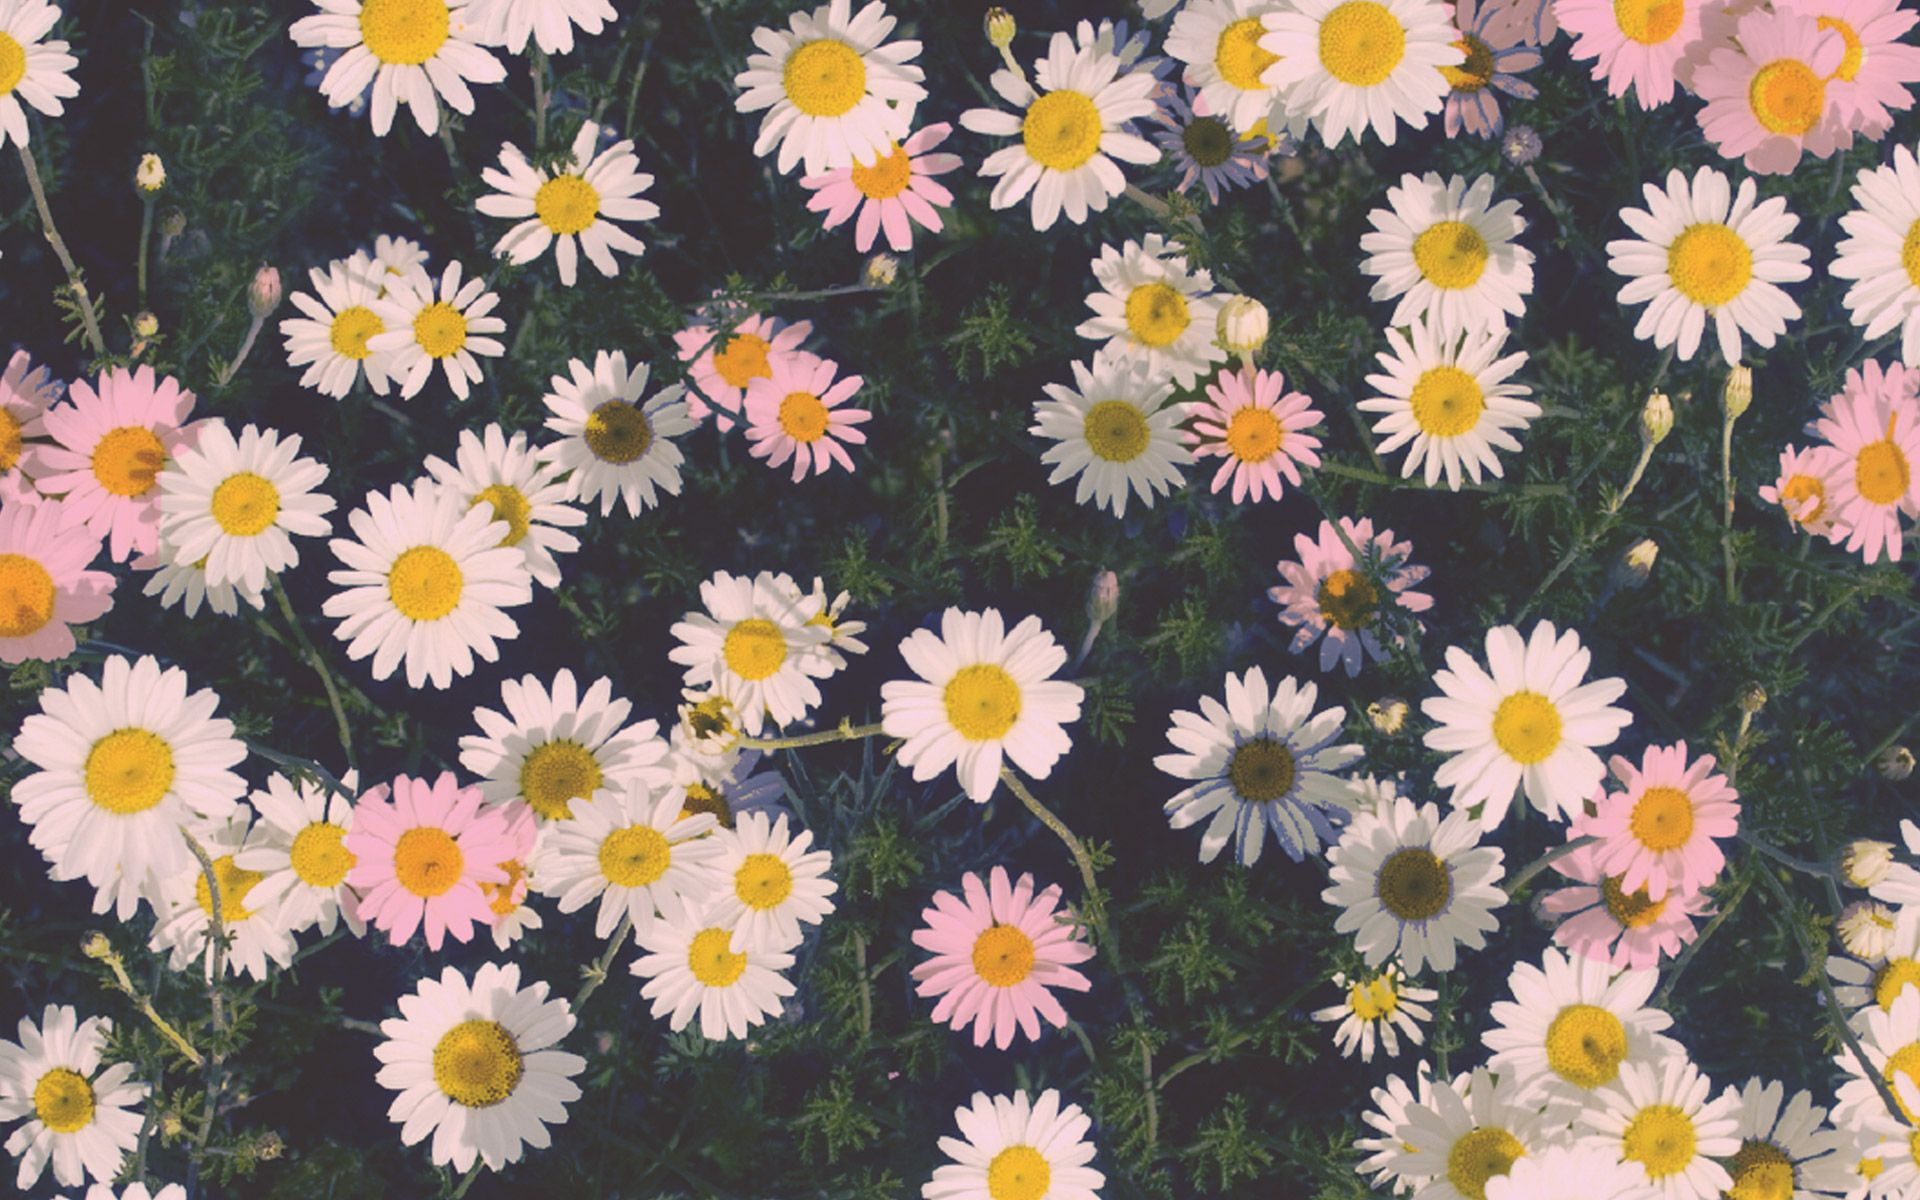 Iphone 6 wallpaper tumblr flower - Iphone 6 Wallpaper Tumblr Flower 34